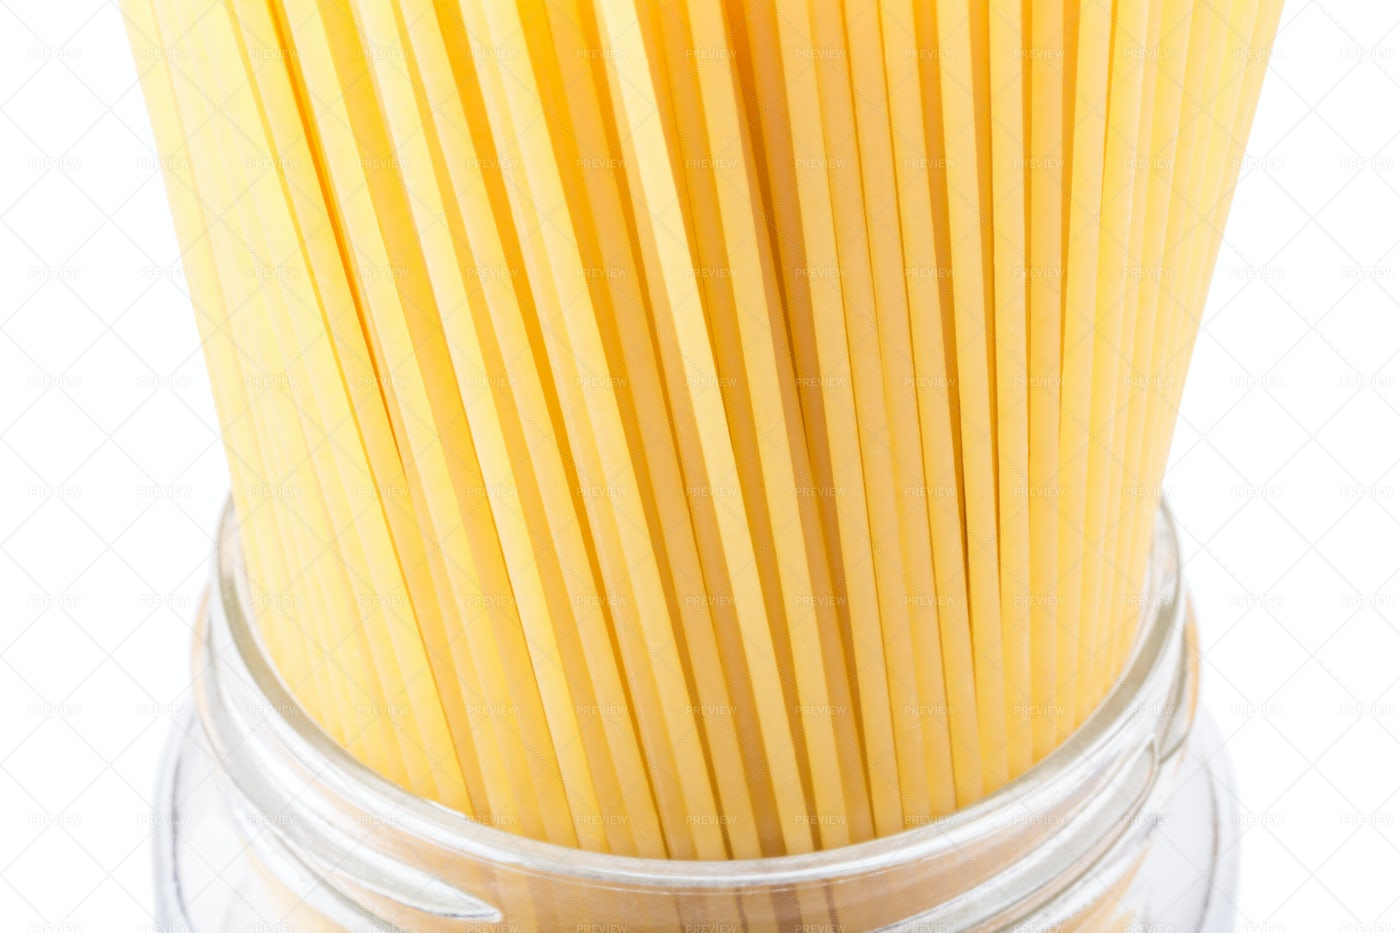 Spaghetti In A Jar: Stock Photos